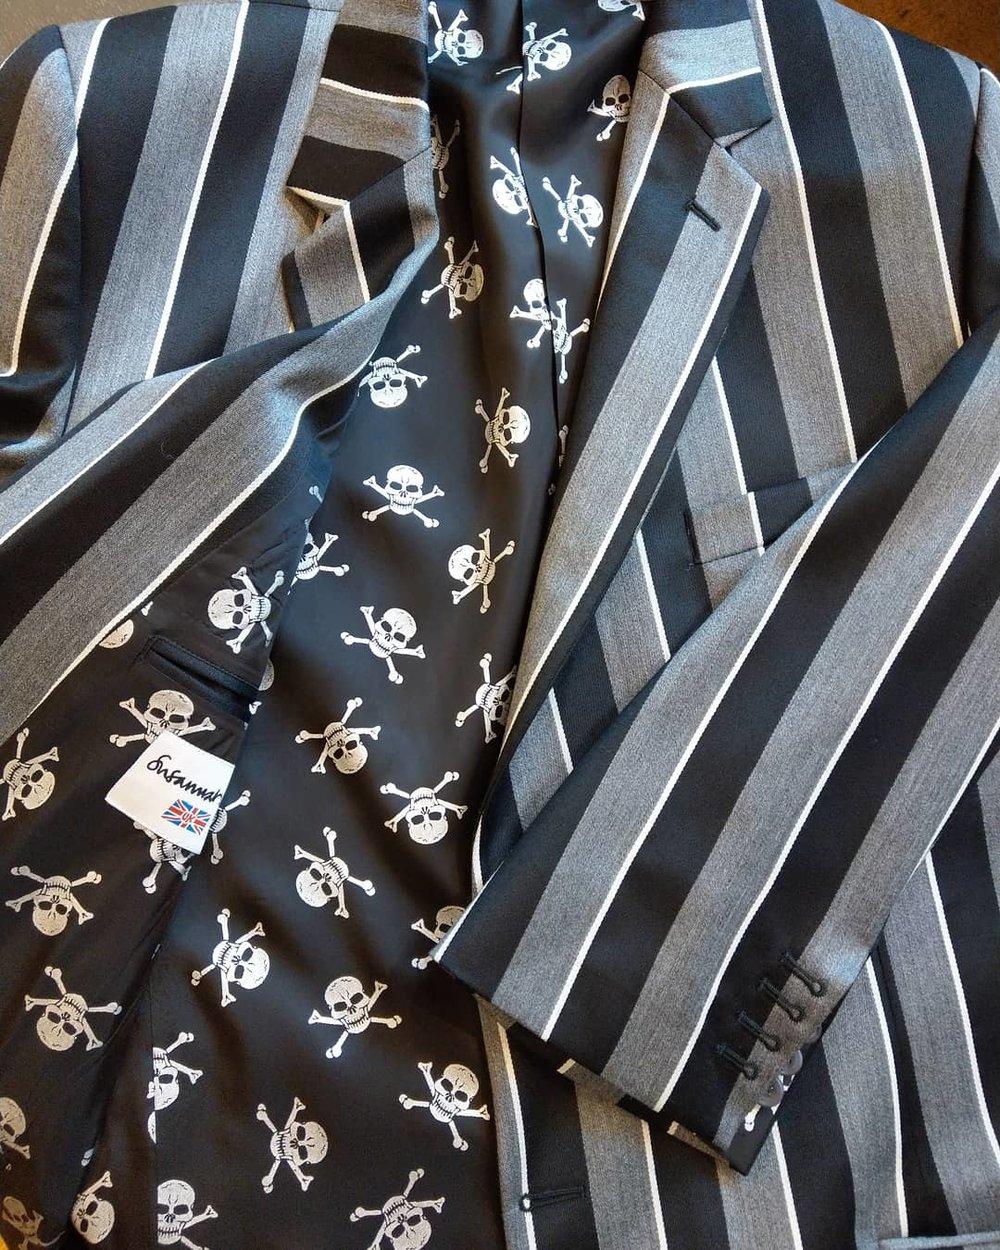 susannah-hall-bespoke-tailor-suit-bateman-ogden-skull-lining-gomez-addams-style.jpg